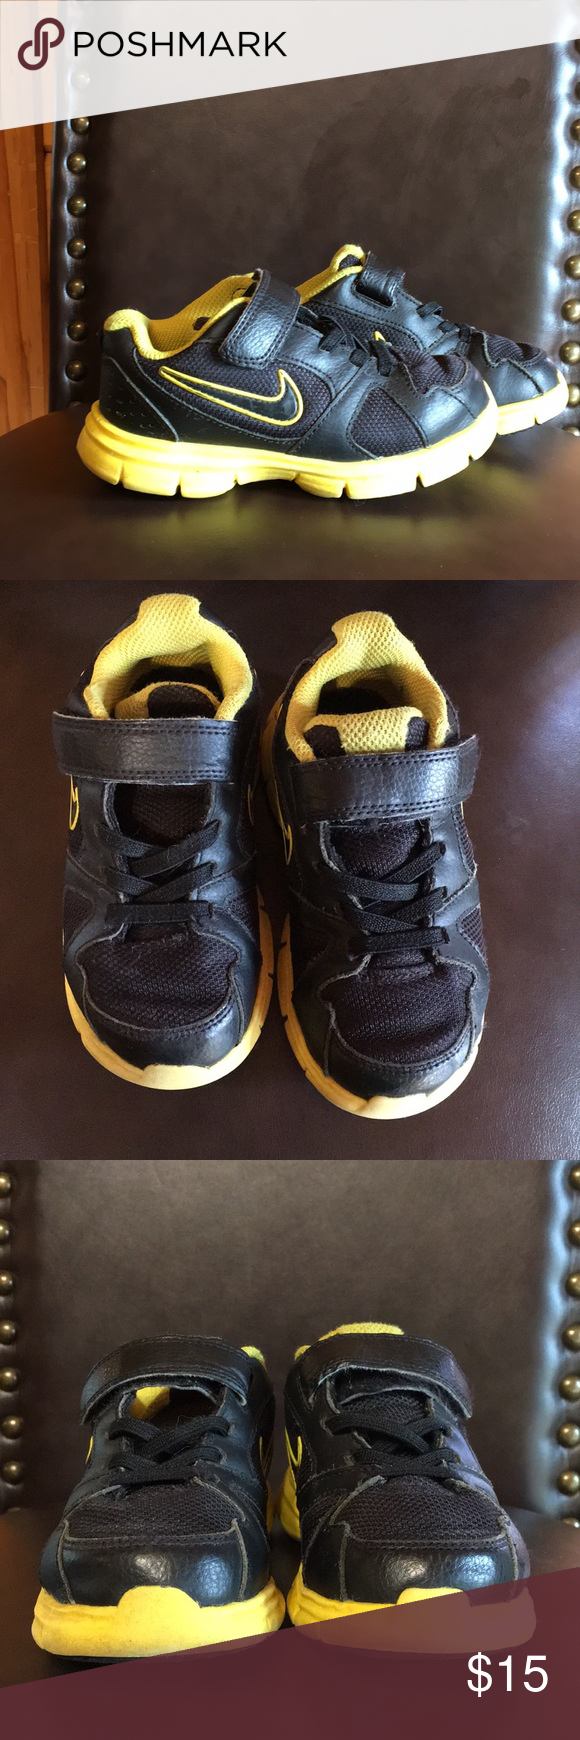 Toddler Black Nike Sneakers Size 9 Black Nikes Black Nike Sneakers Nike Tennis Shoes